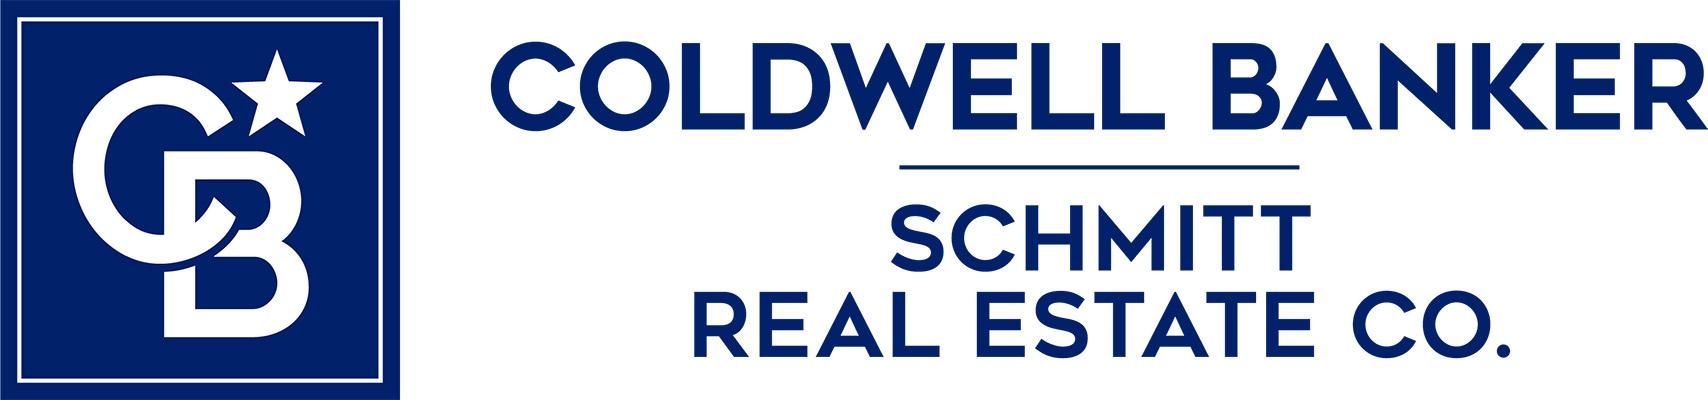 Nira Tocco - Coldwell Banker Logo